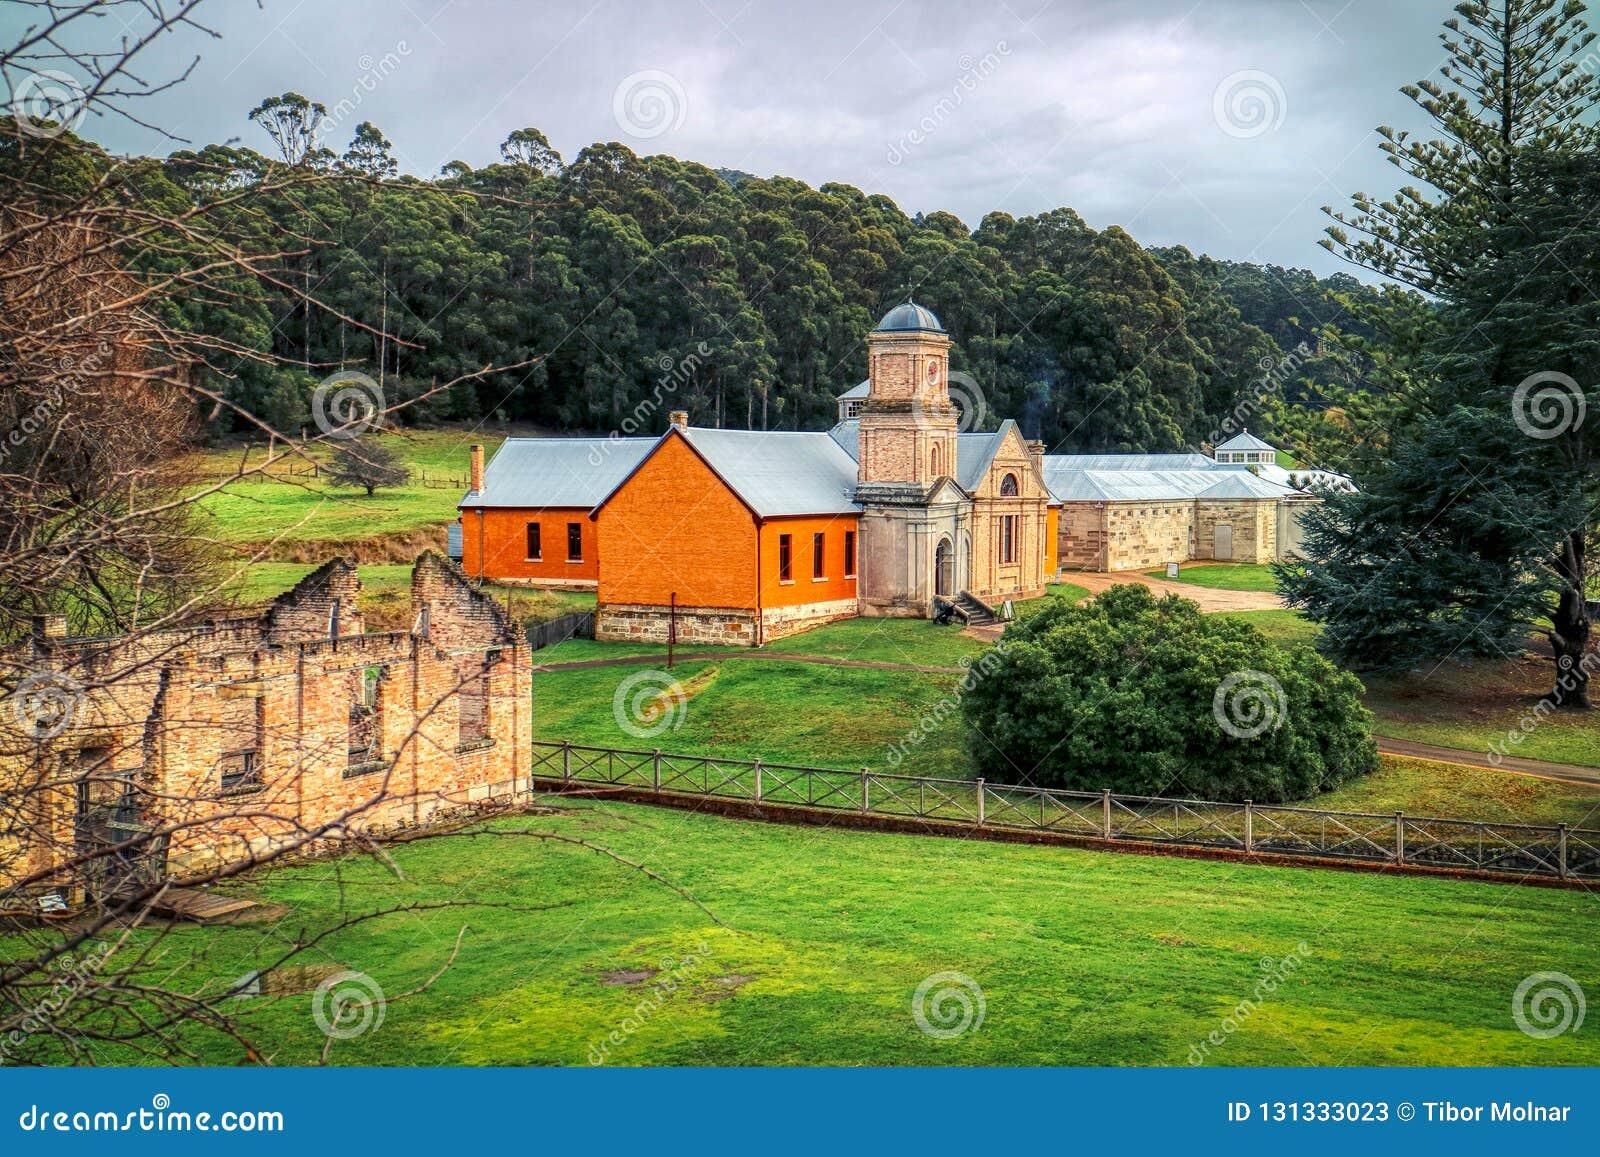 Port Arthur Penal Colony Historic Site, the Asylum building, completed in 1868 Tasman Peninsula, Tasmania, Australia